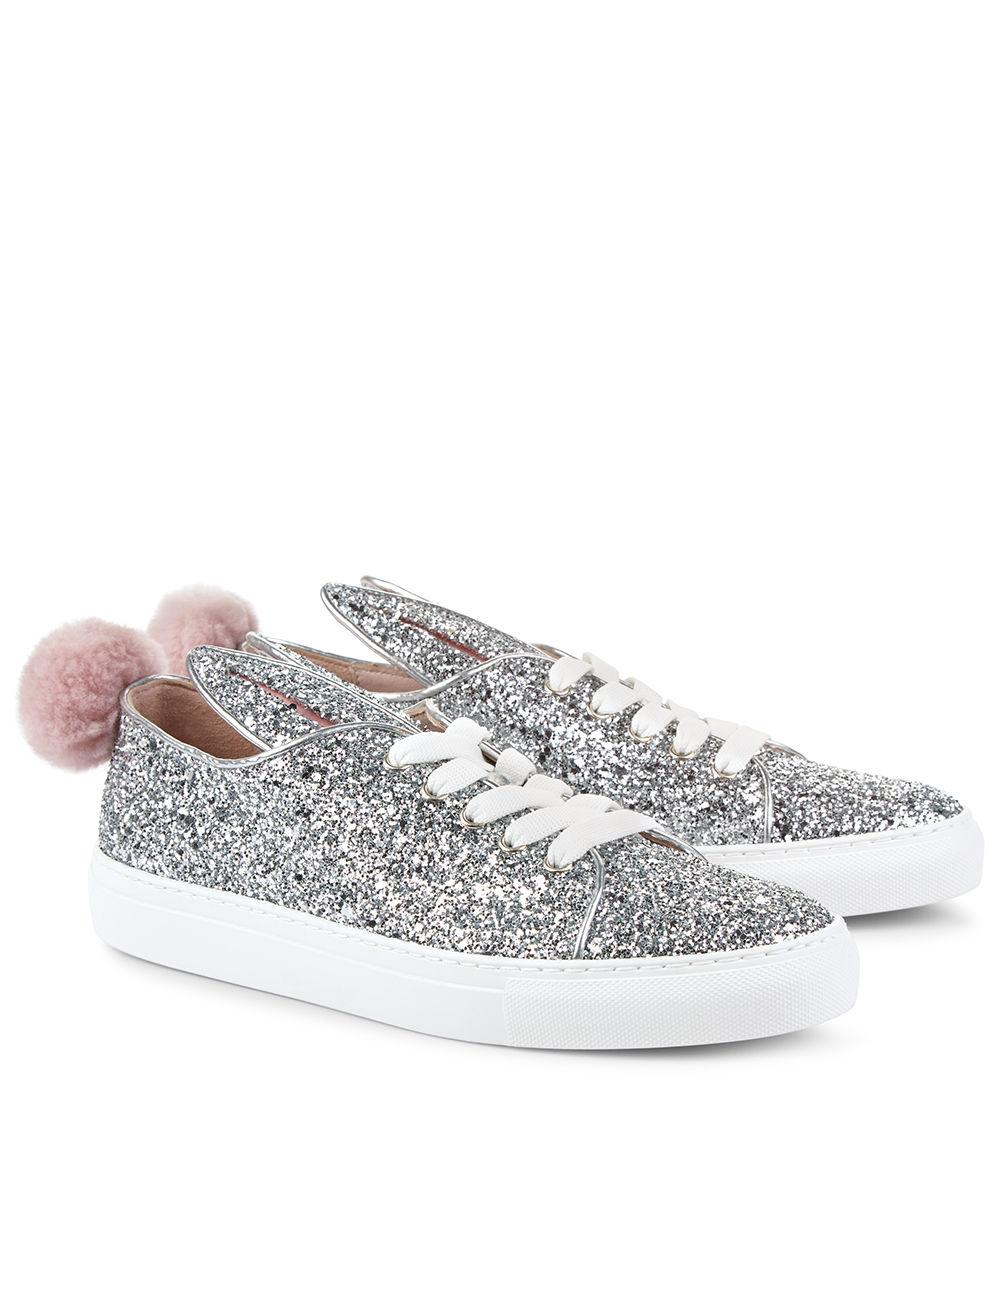 Minna Parikka Silver Glitter Bunny Tail Sneakers In